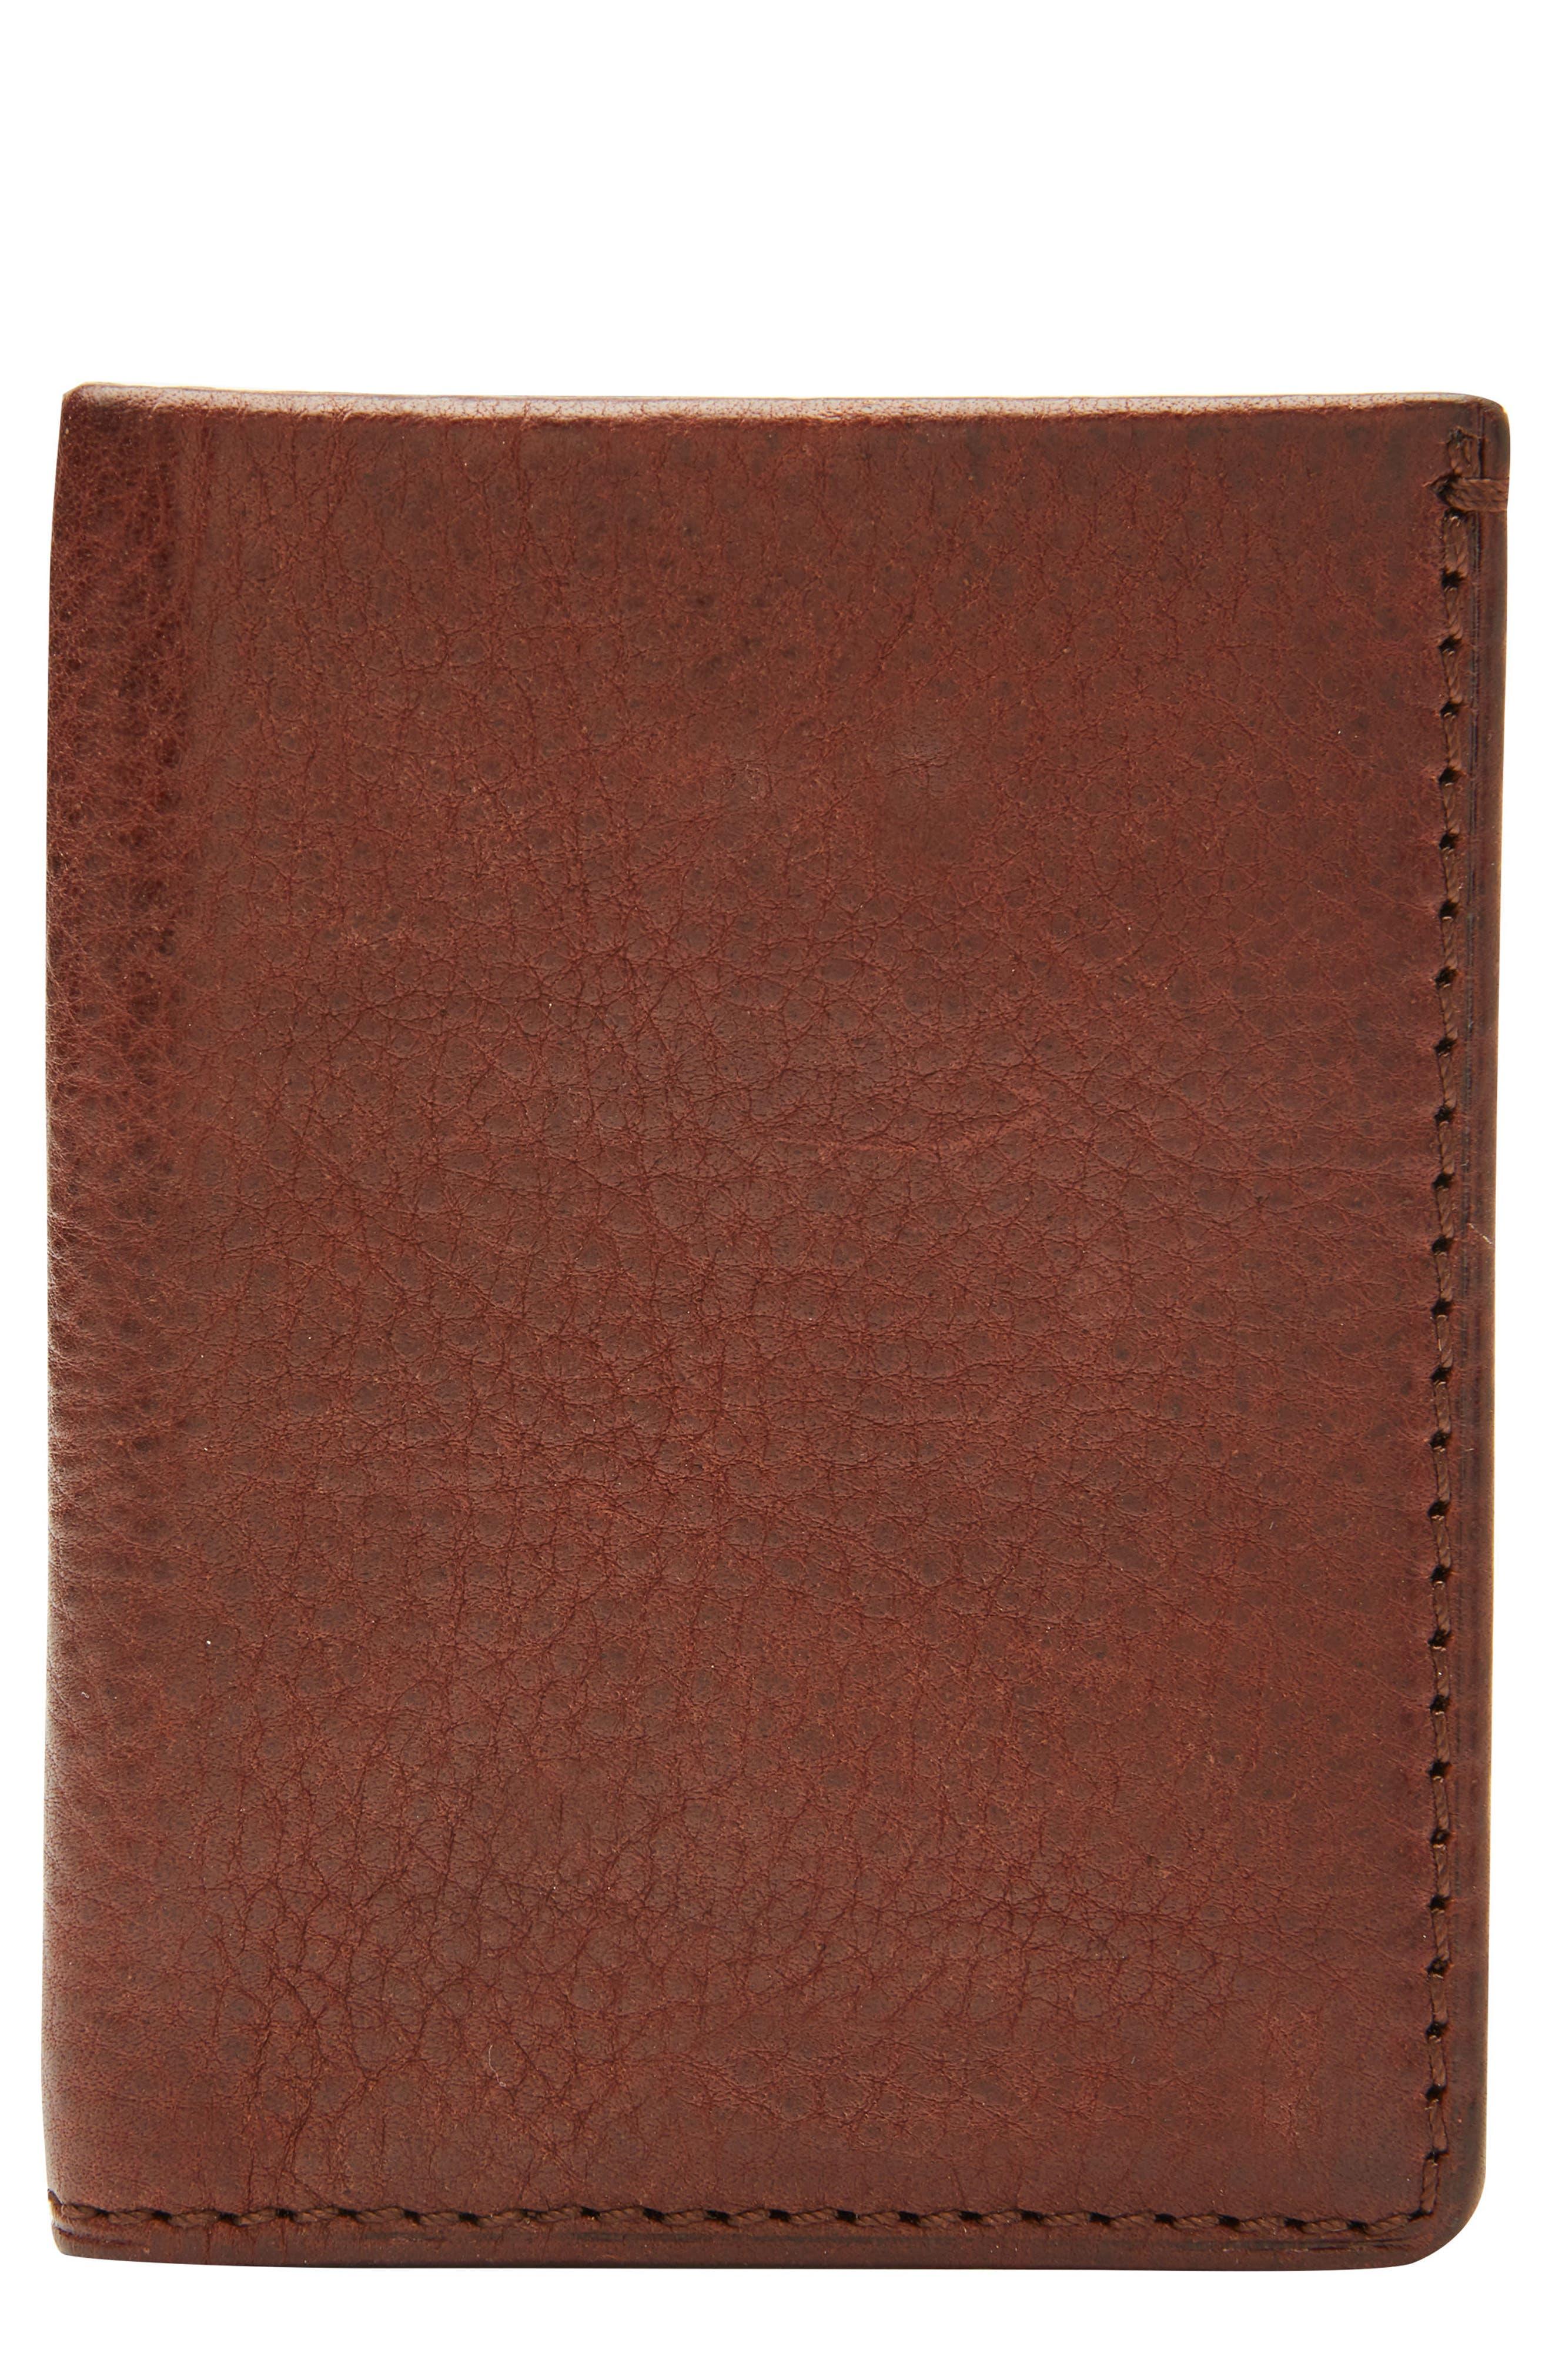 Main Image - Jack Mason Leather with Selvedge Denim Card Case